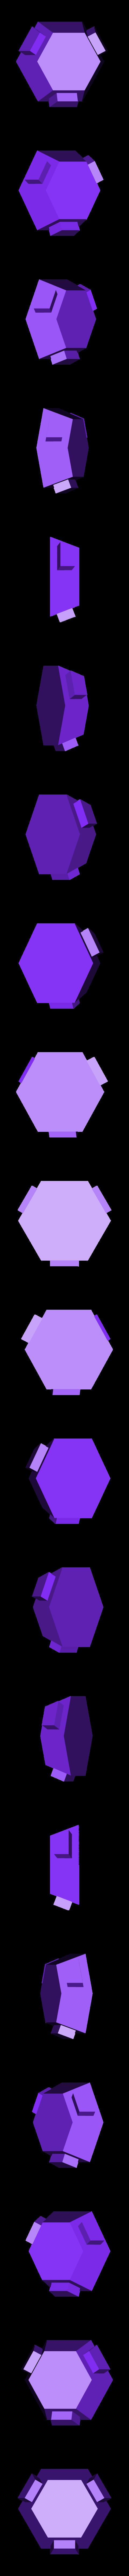 hexagon.stl Download free STL file Soccer ball (Truncated icosahedron) assembly • 3D printer object, mattias_selin